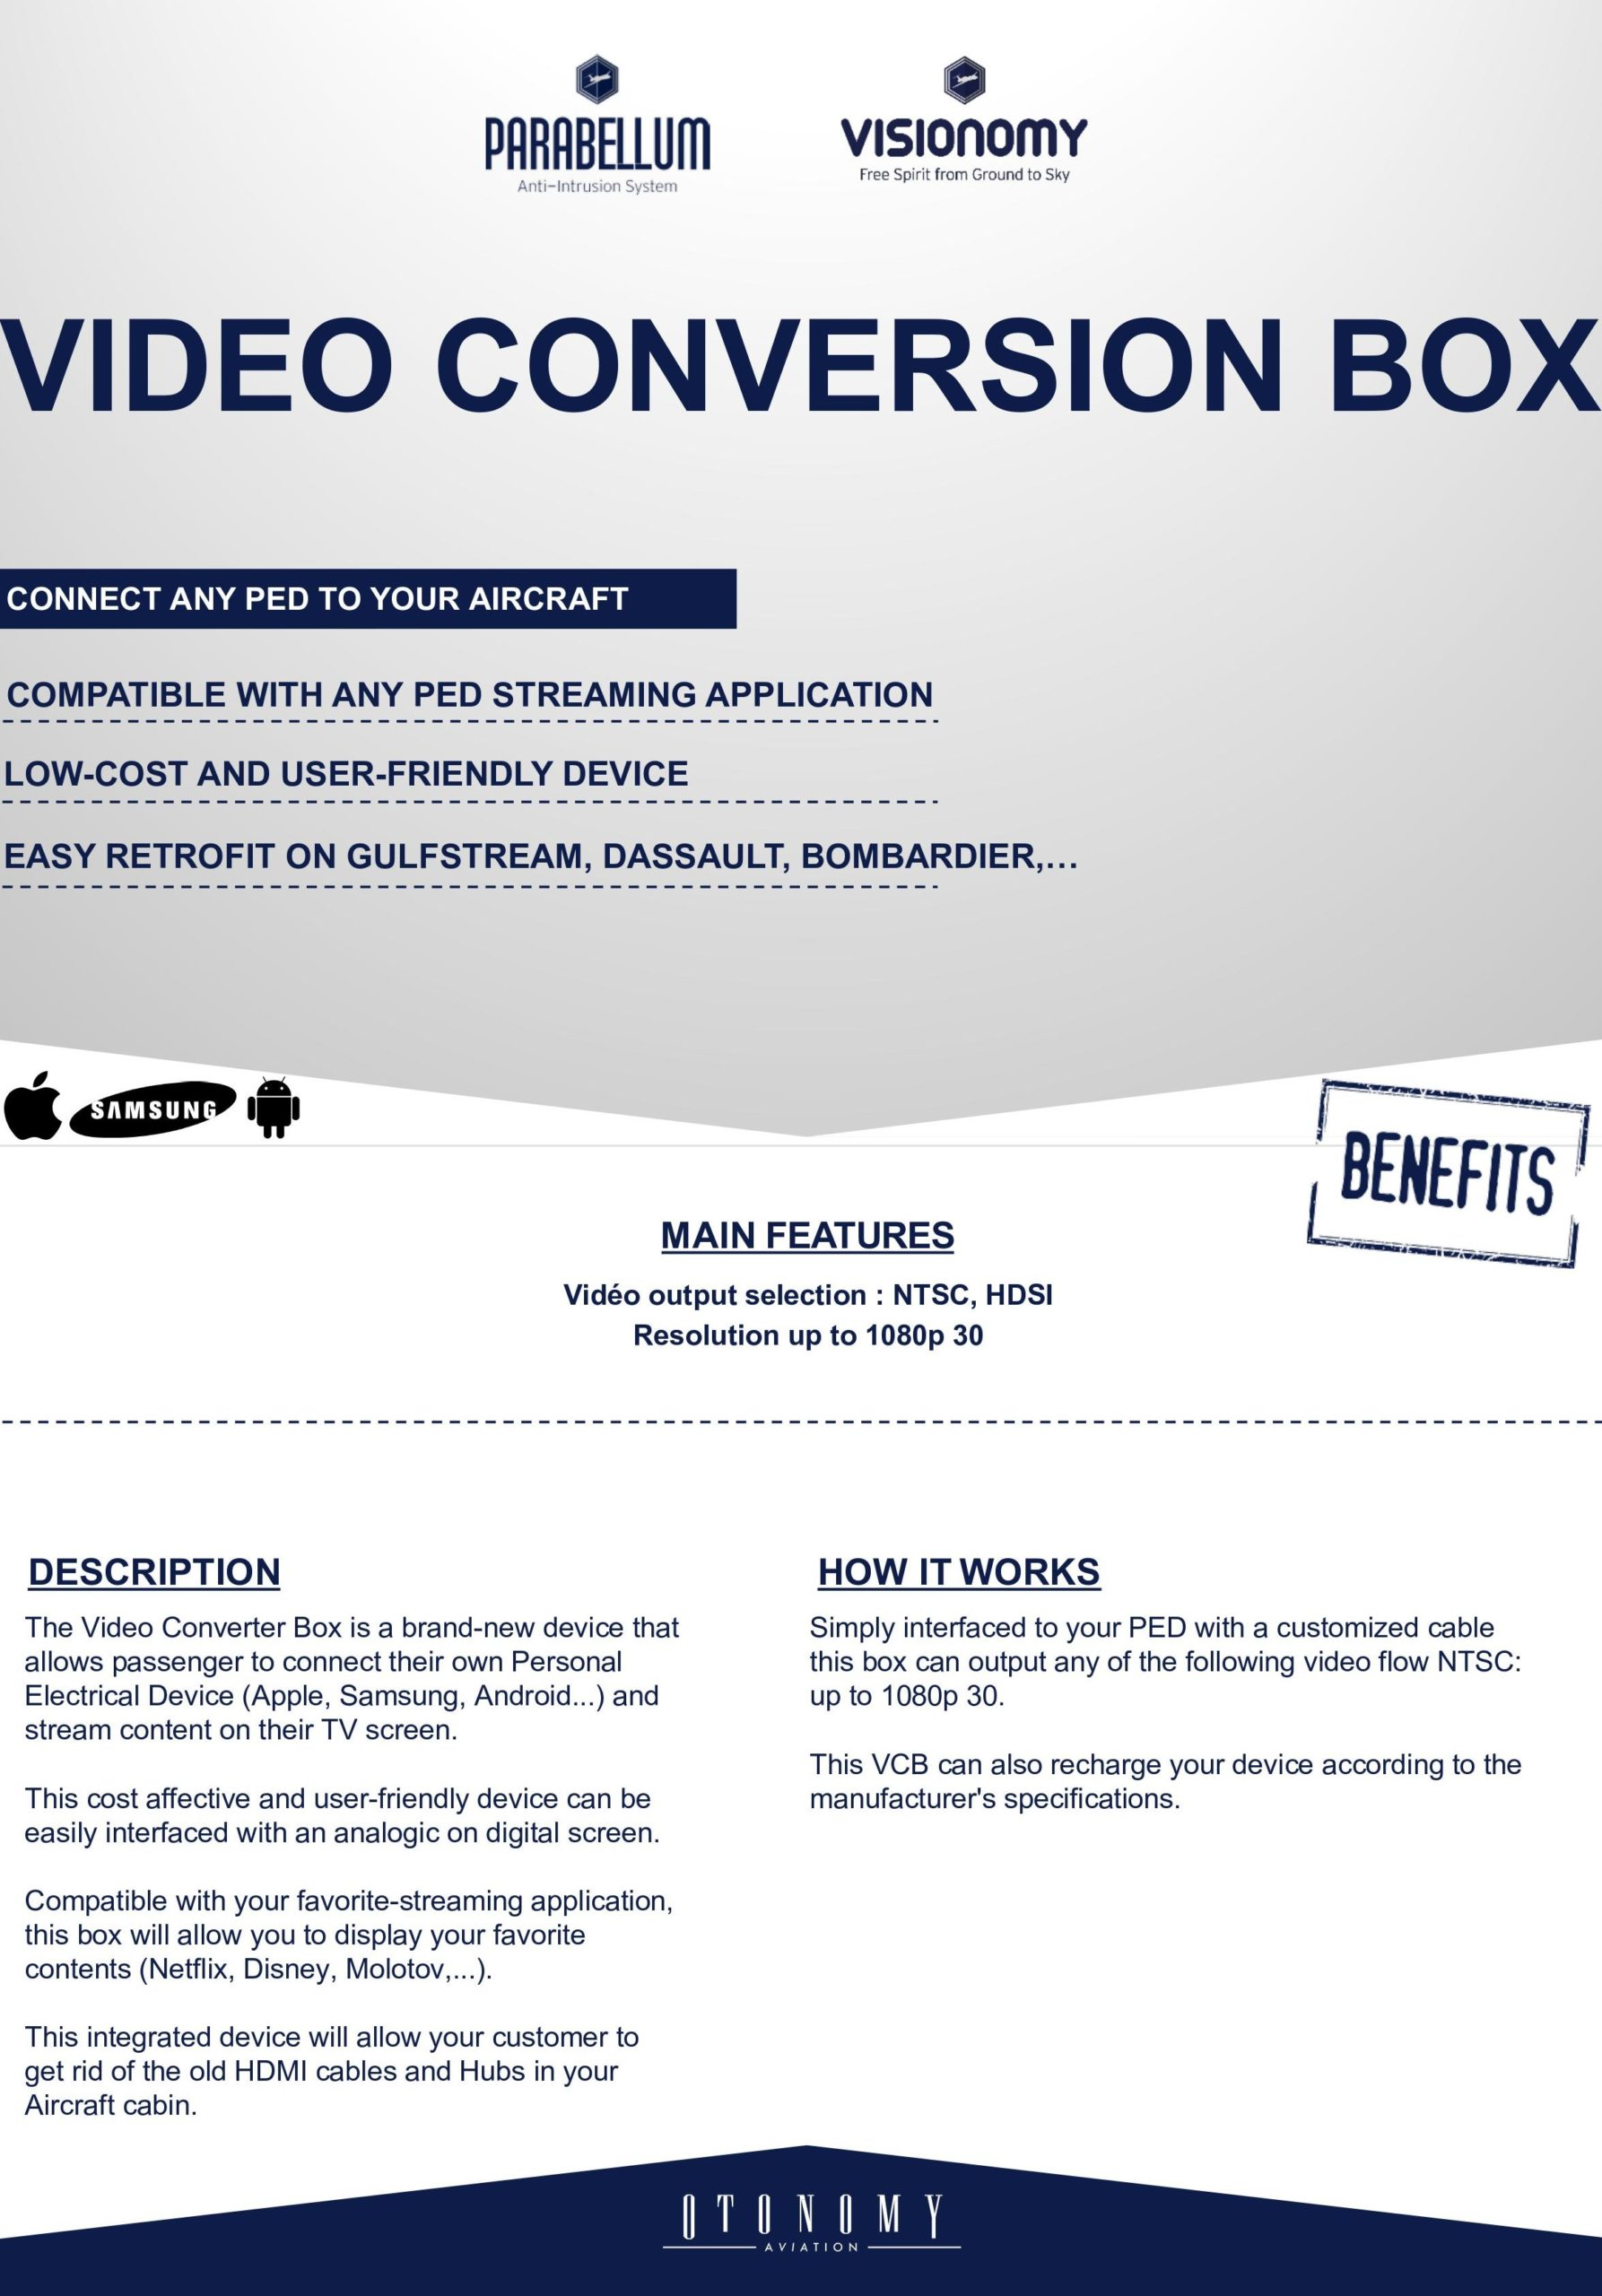 VIDEO CONVERSION BOX